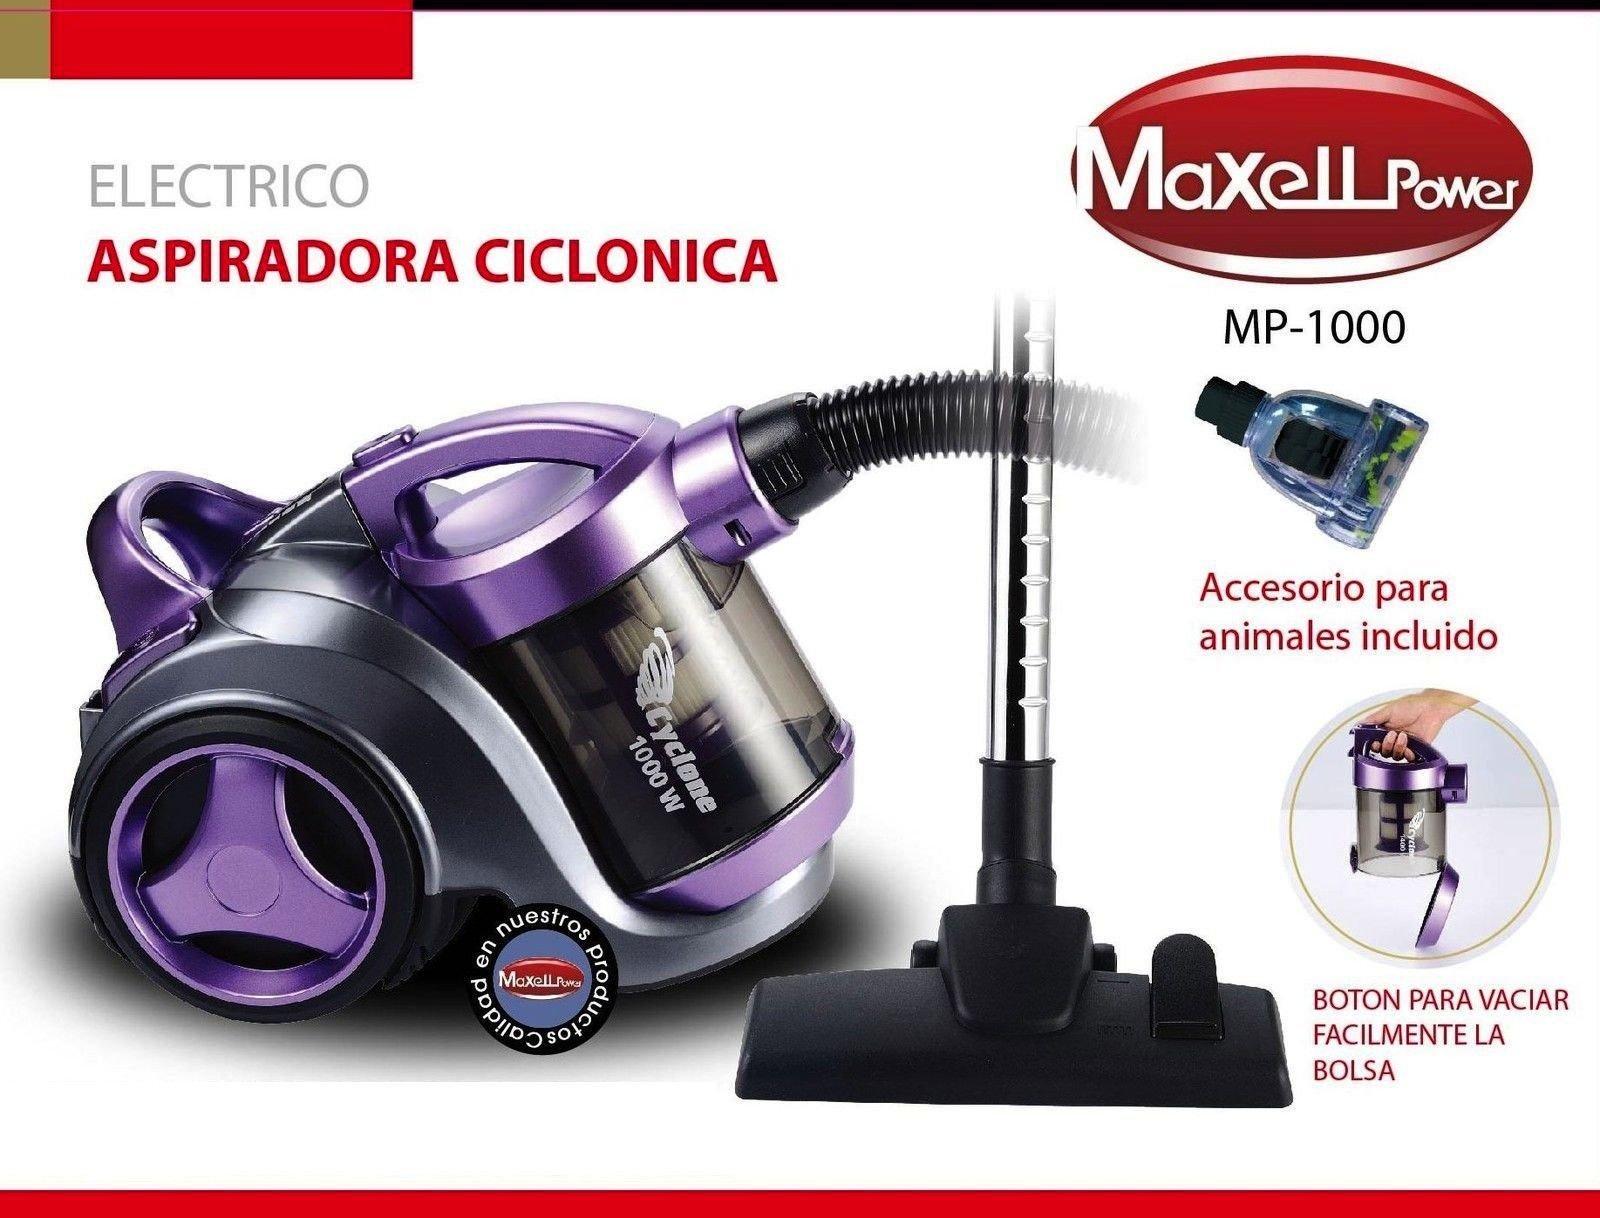 MAXELLPOWER Aspirador aspiradora ciclónico sin Bolsa Filtro hepa Boquilla Animales Incluido 1000W de Potencia Exclusiva para Clientes: Amazon.es: Hogar